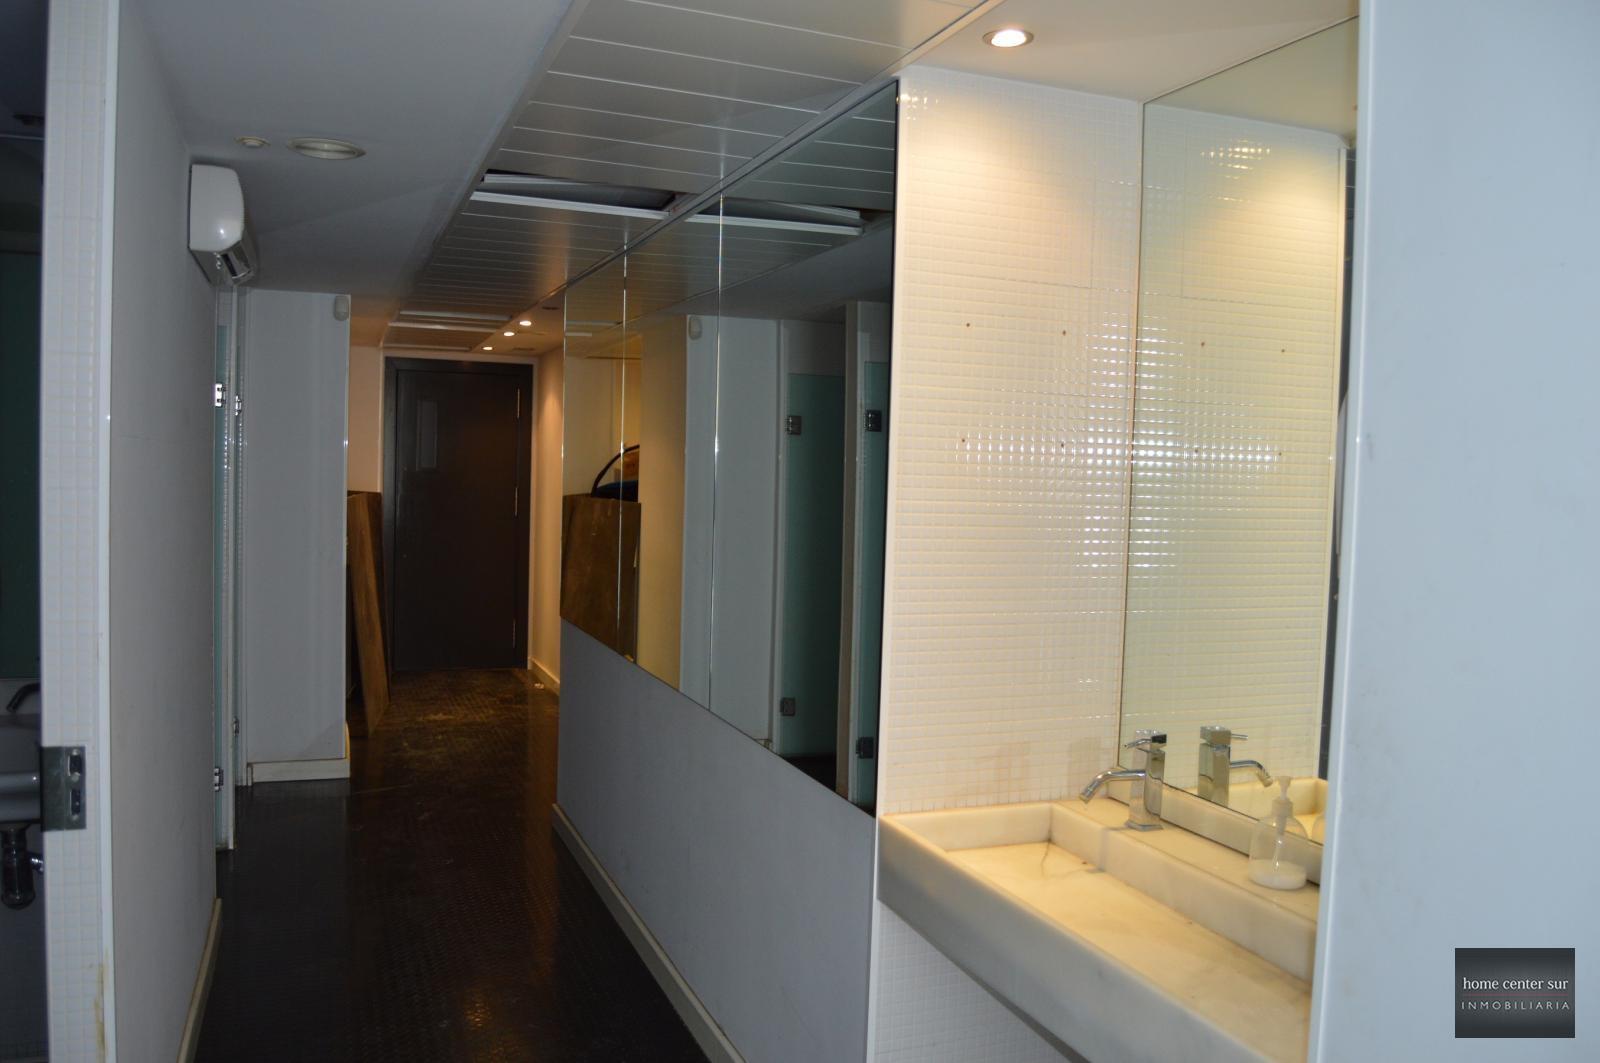 Oficina en alquiler en Avenida Santa Amalia (Fuengirola), 3.600 €/mes